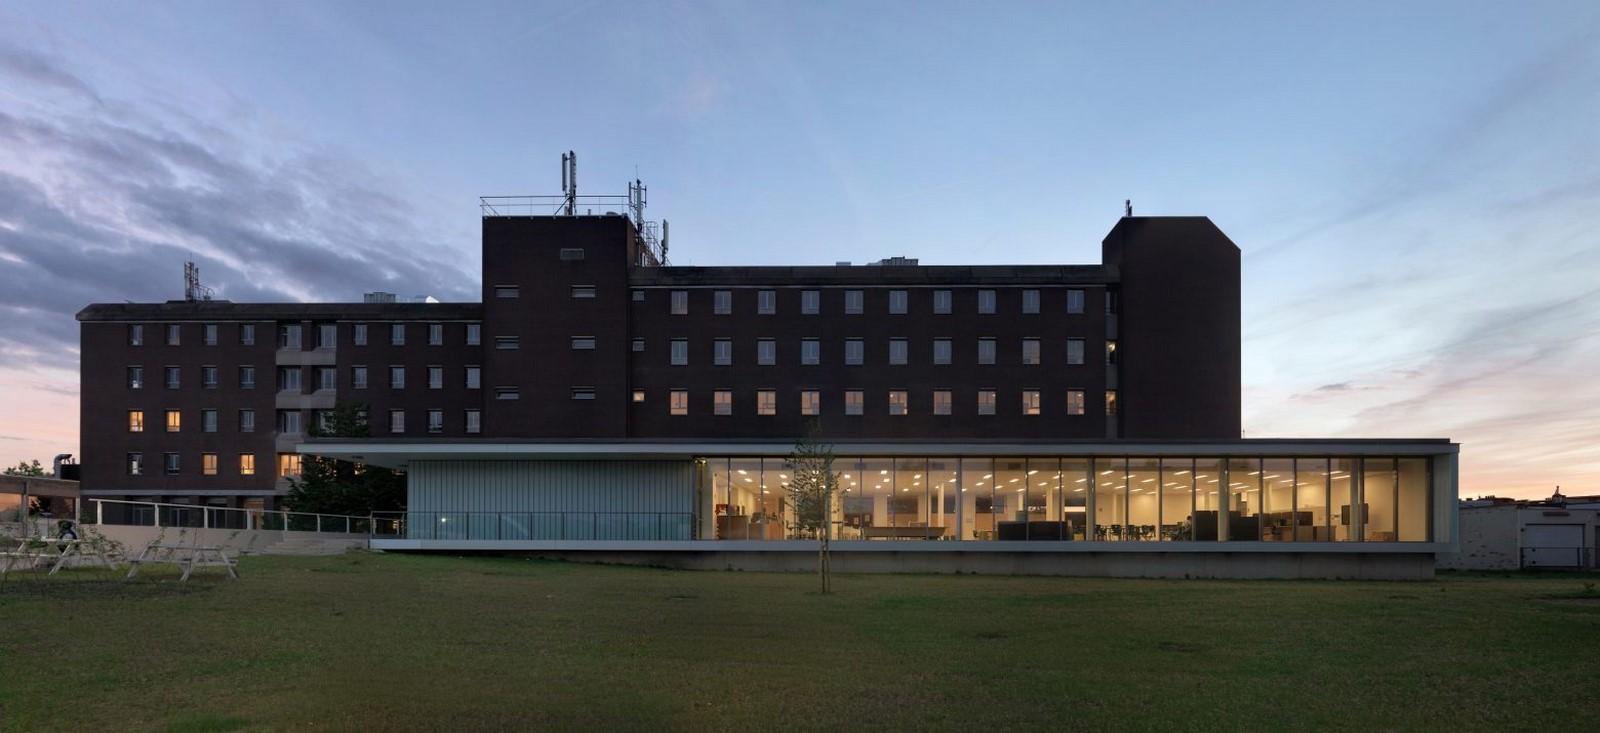 Architects in Breda - Top 55 Architects in Breda - Sheet22